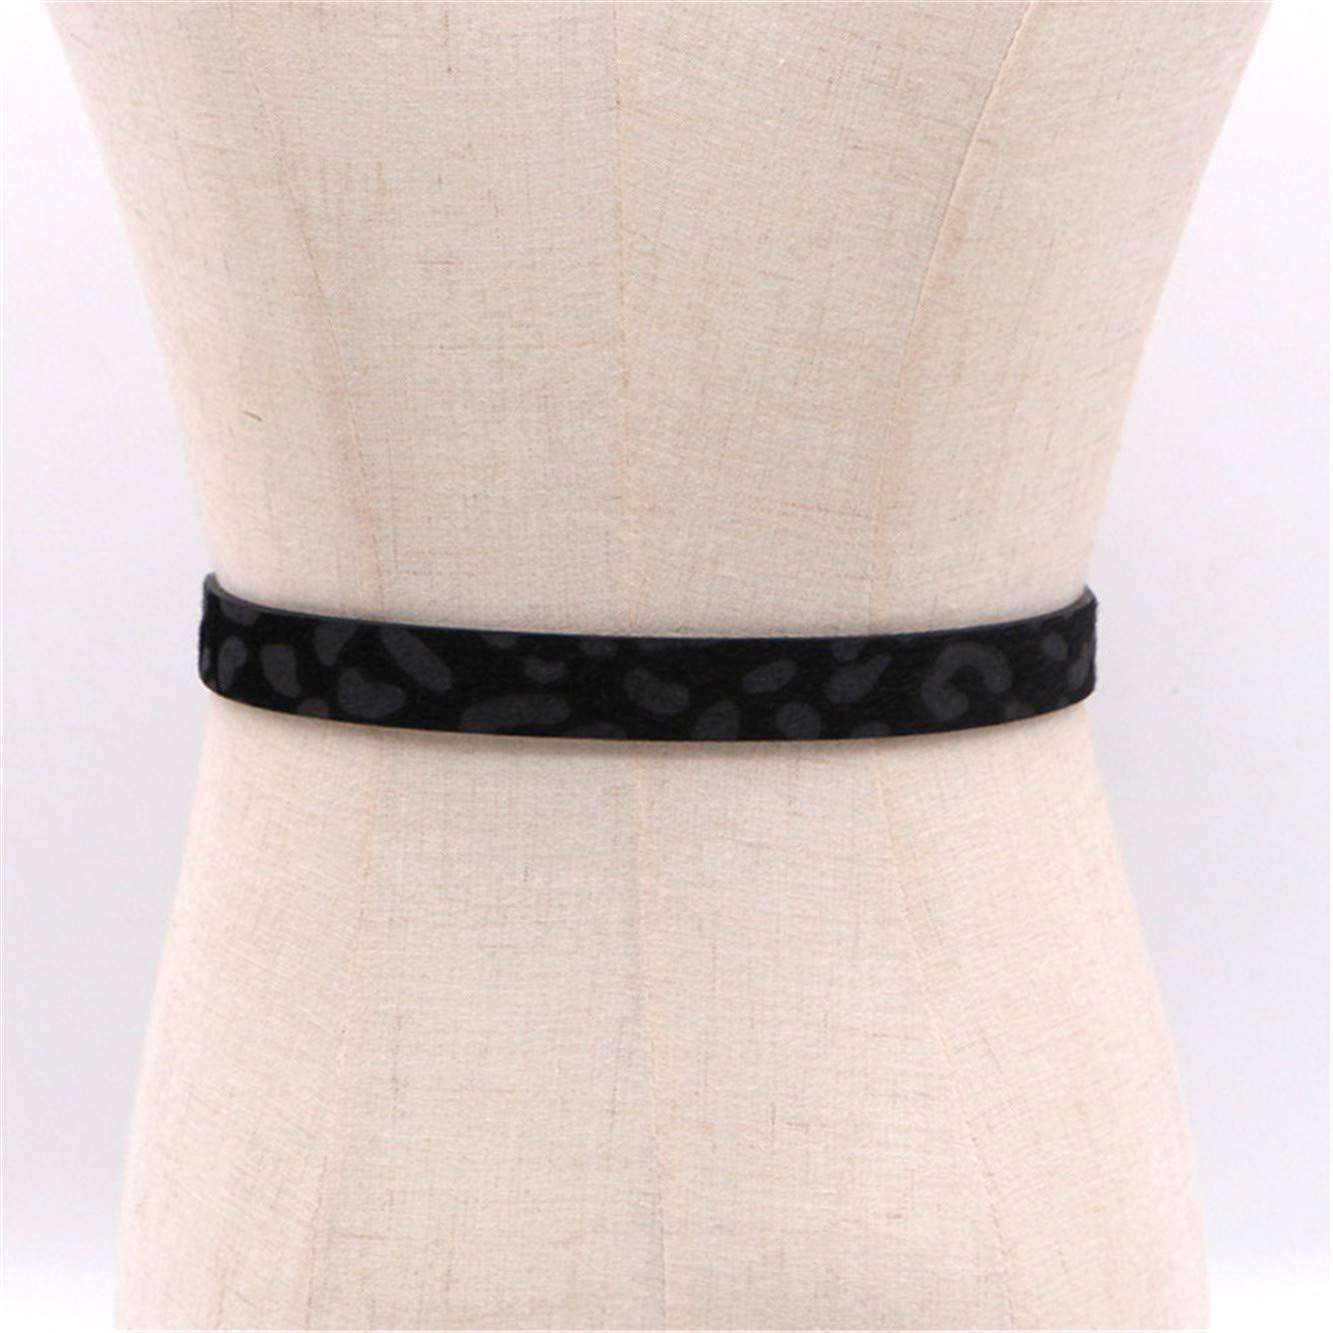 TIFENNY Women/'s Leopard Horse Hair Decorative Pockets Dual-use Mobile Phone Bag Fashion Convenience Purse